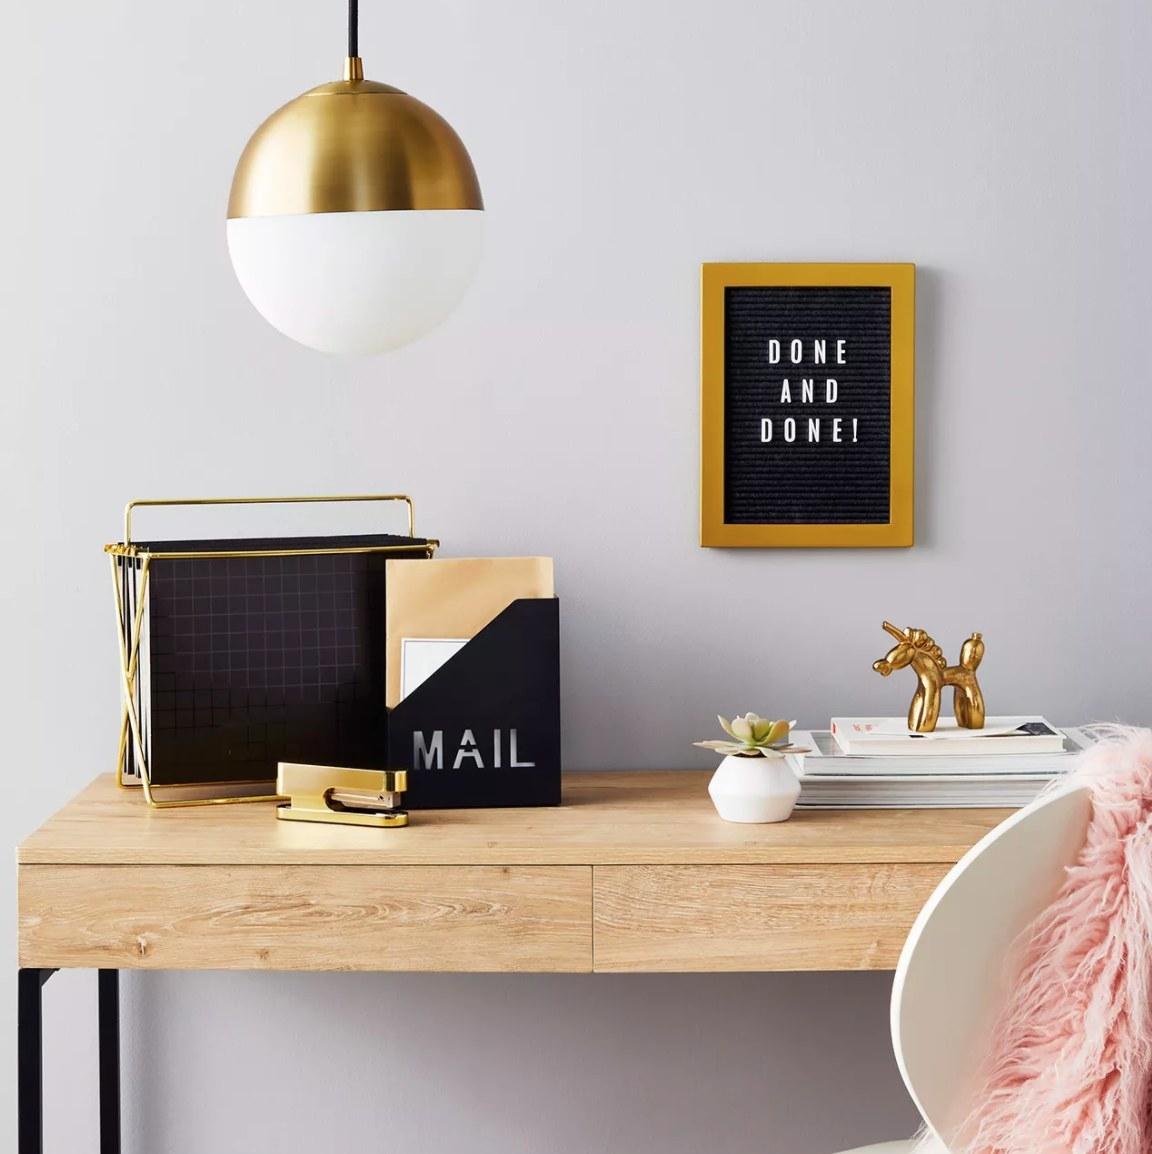 The black mail holder